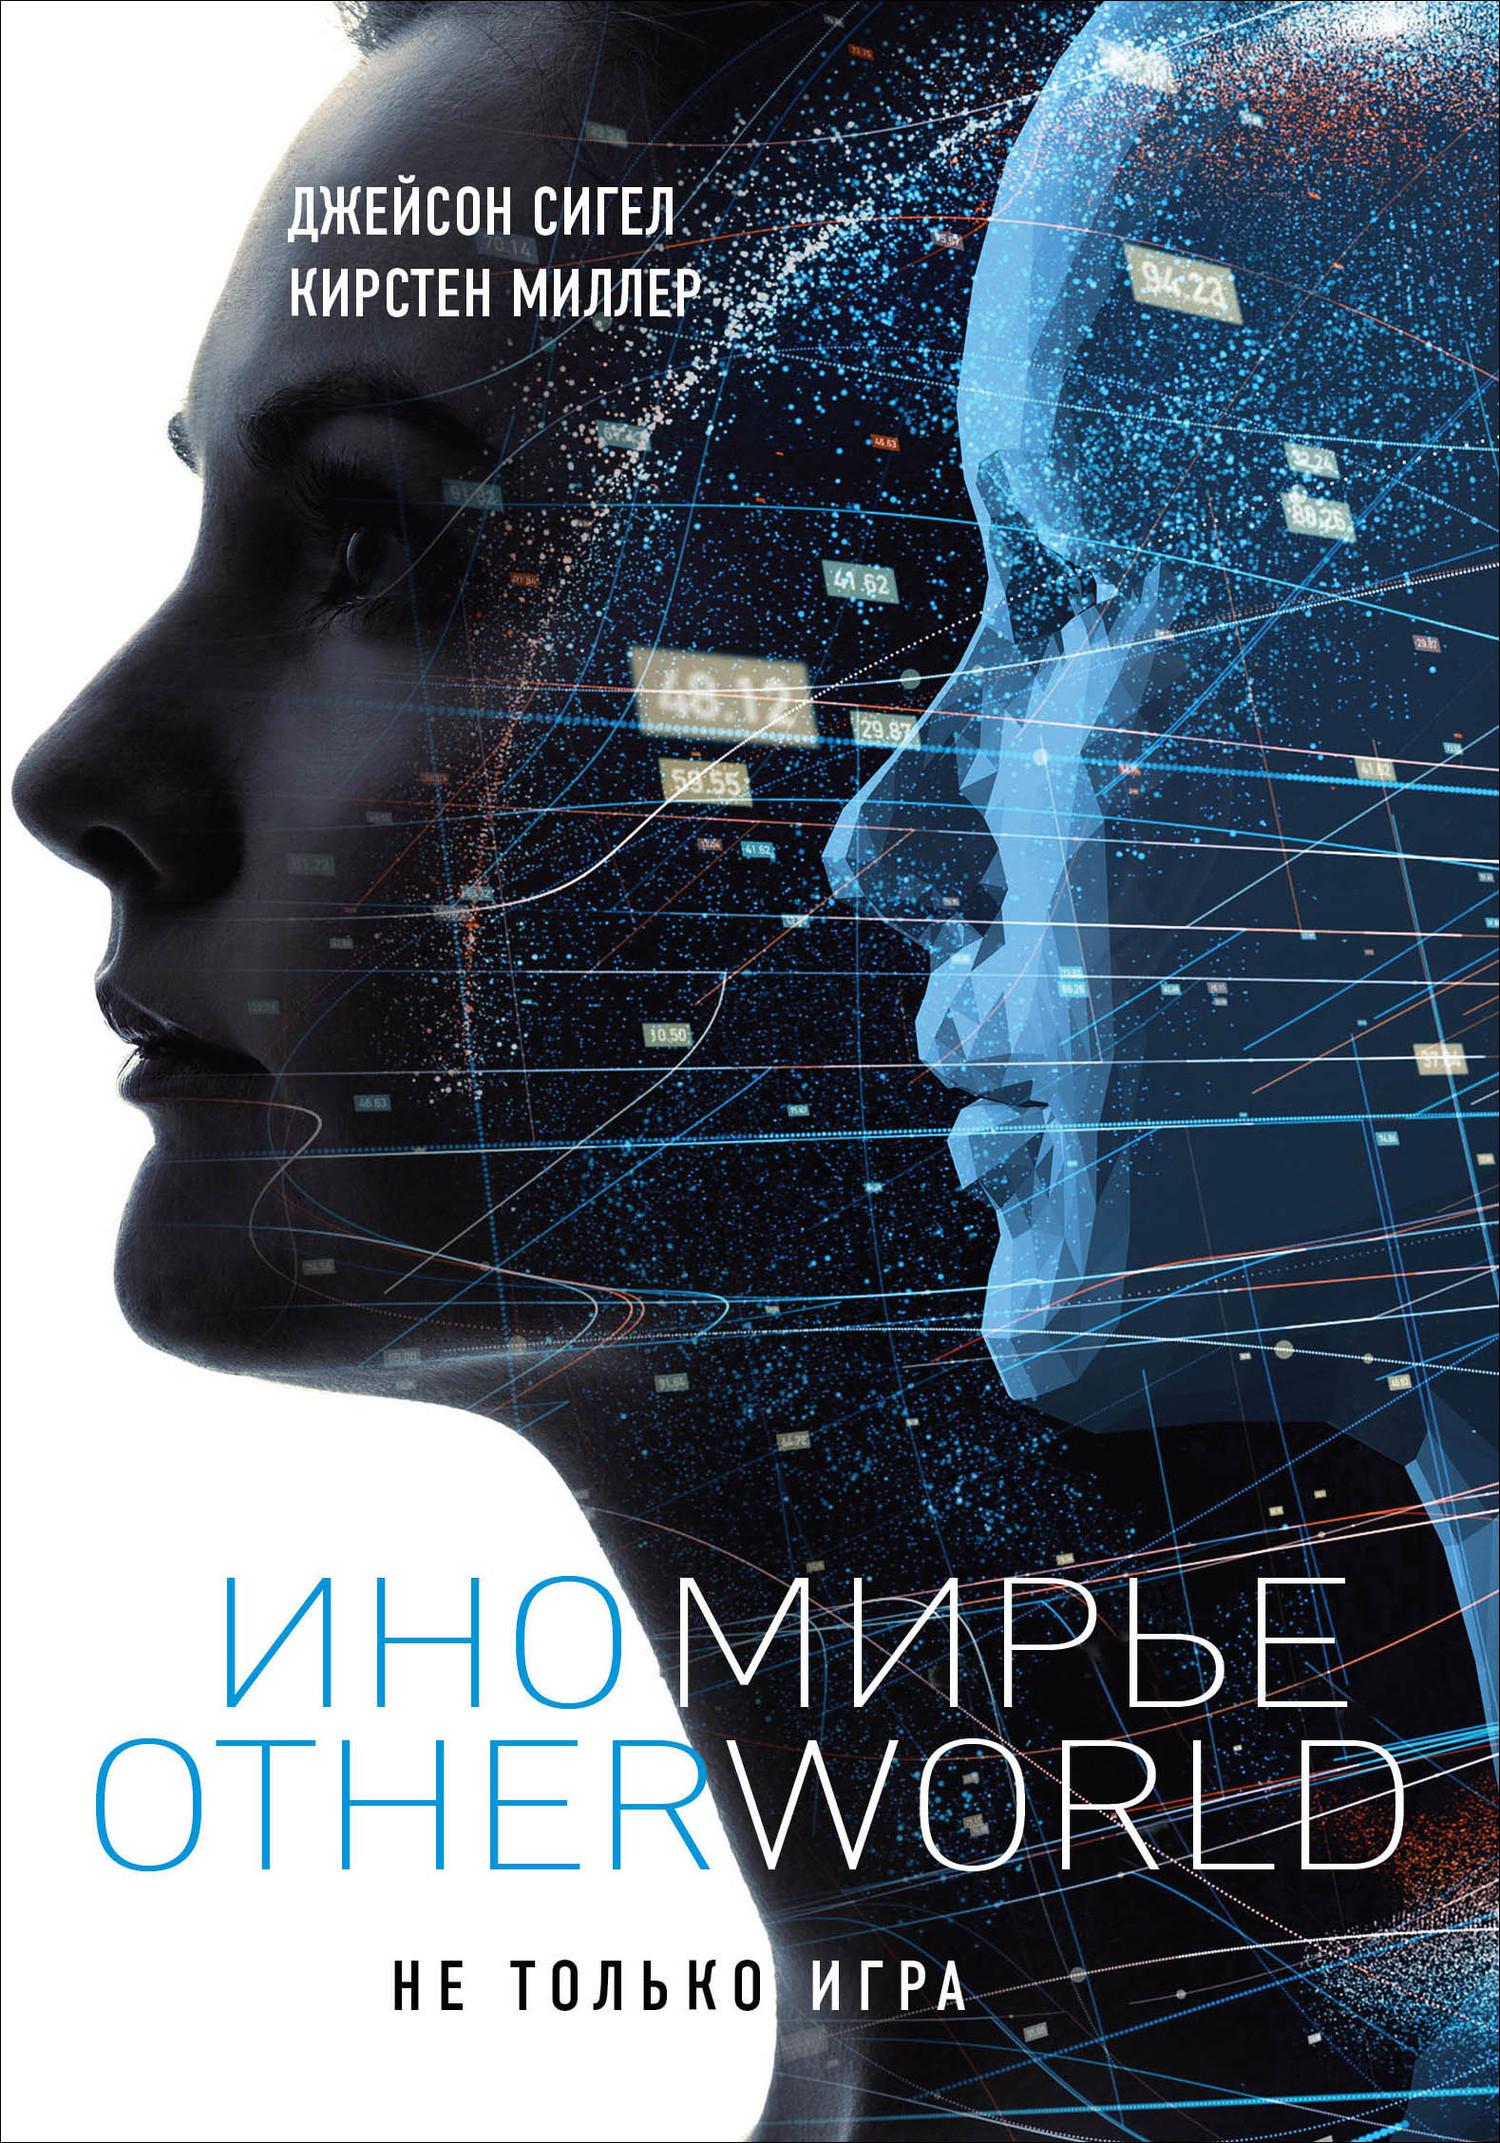 Книга  Иномирье. Otherworld e04e800f63667